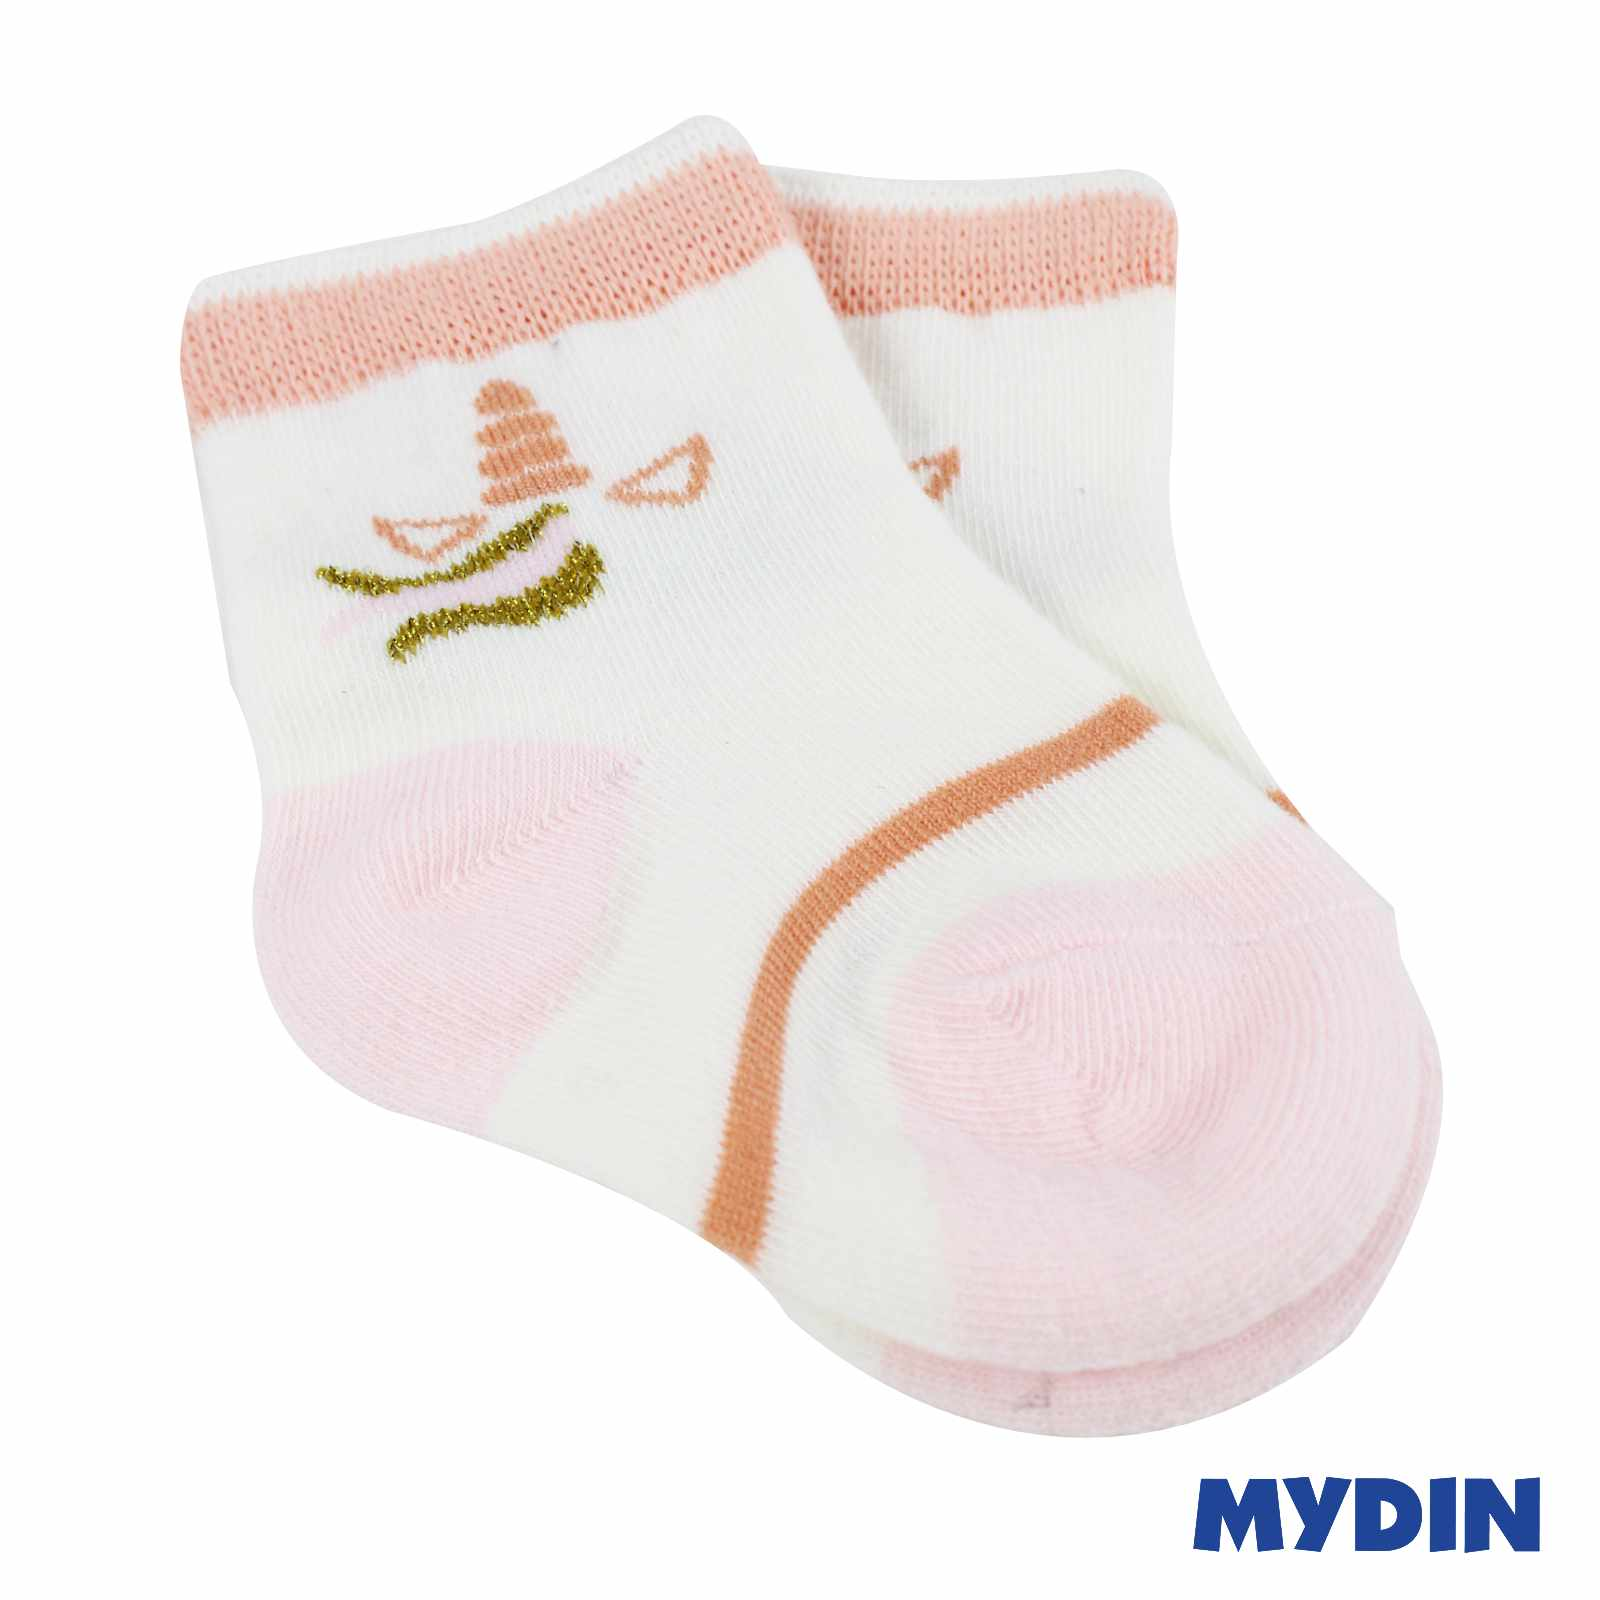 MYBB Pink Baby Socks 3 Pairs (0-1years) 1219WYBNCE05B